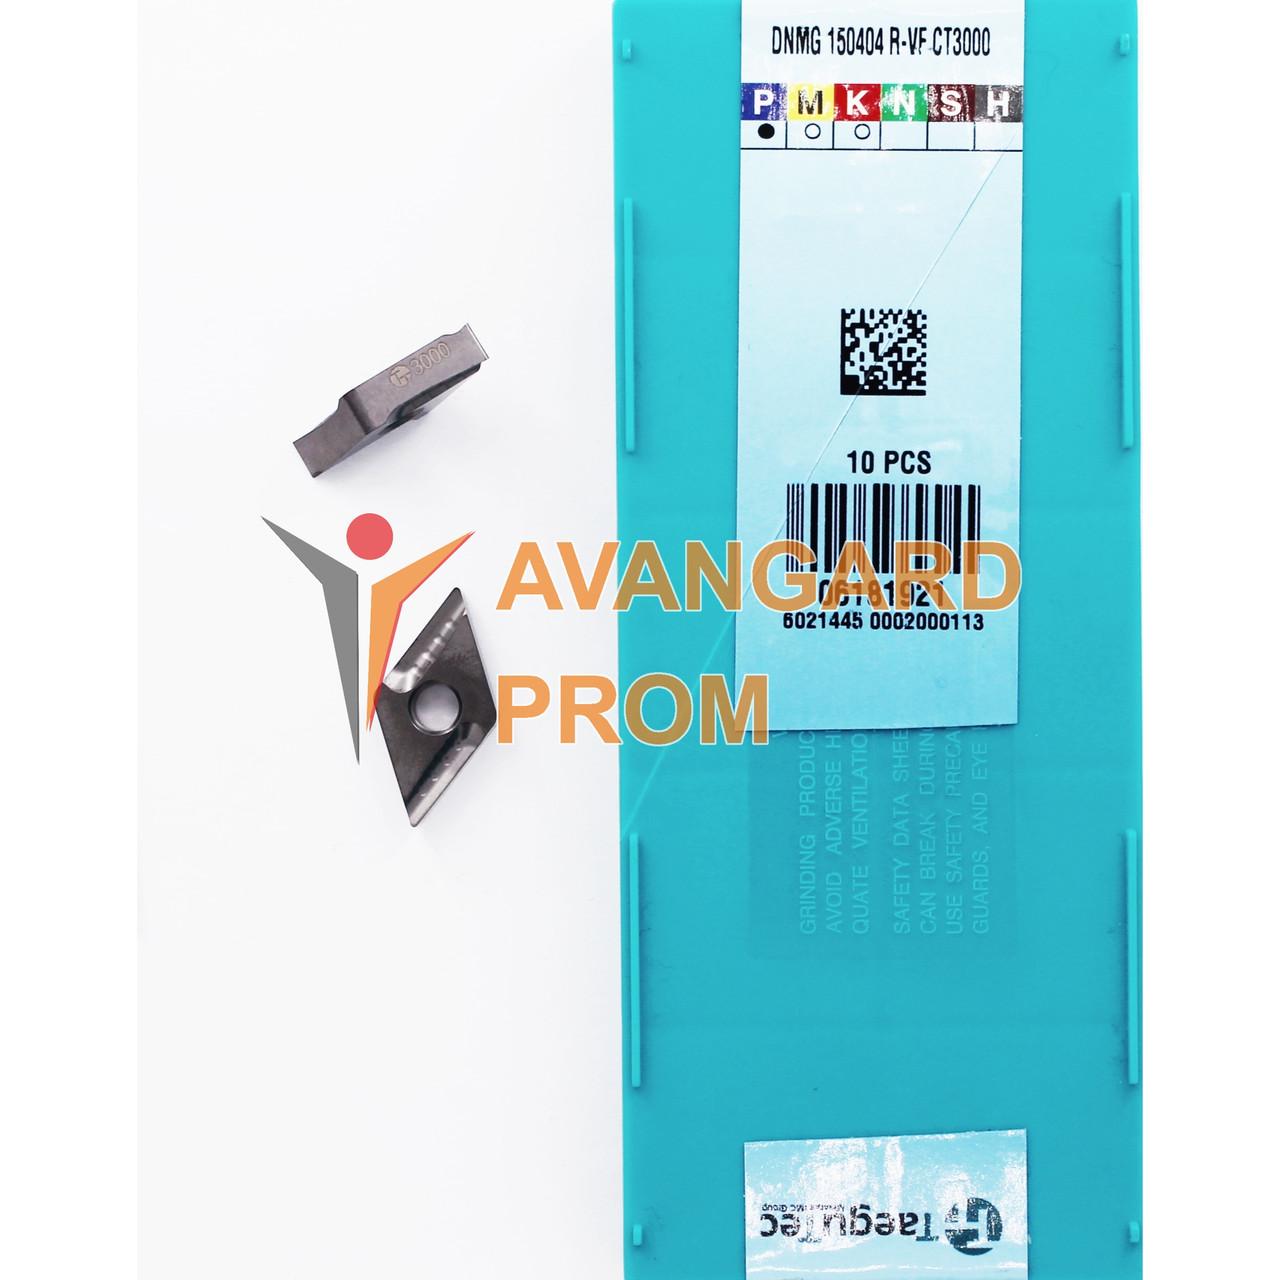 Пластина TaeguTec DNMG150404R-VF